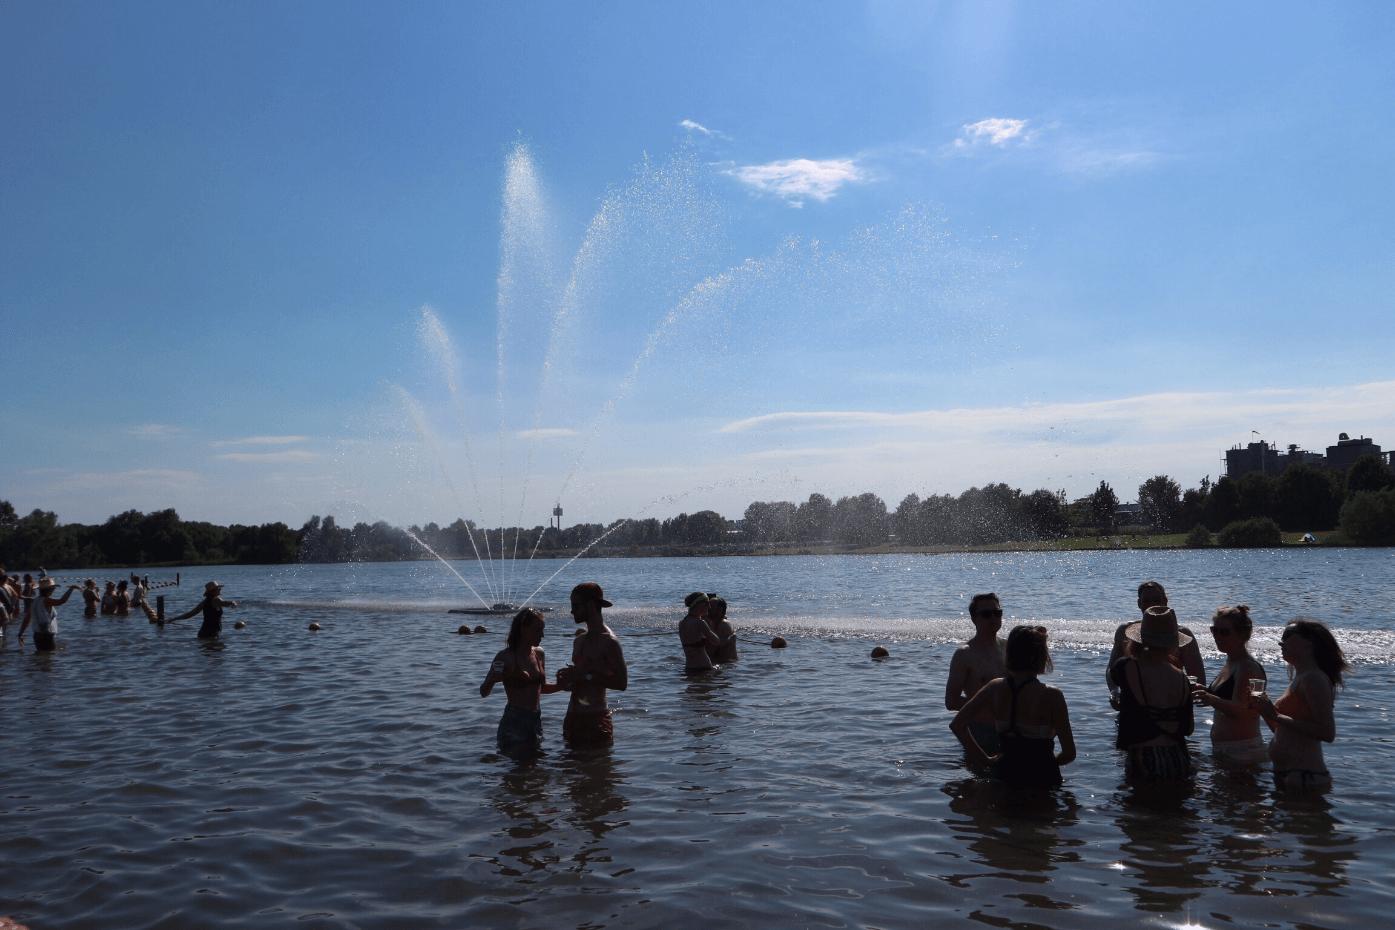 Zwemmen @ Central Park Festival 2017 - Fotocredits: Stefan van Schaik